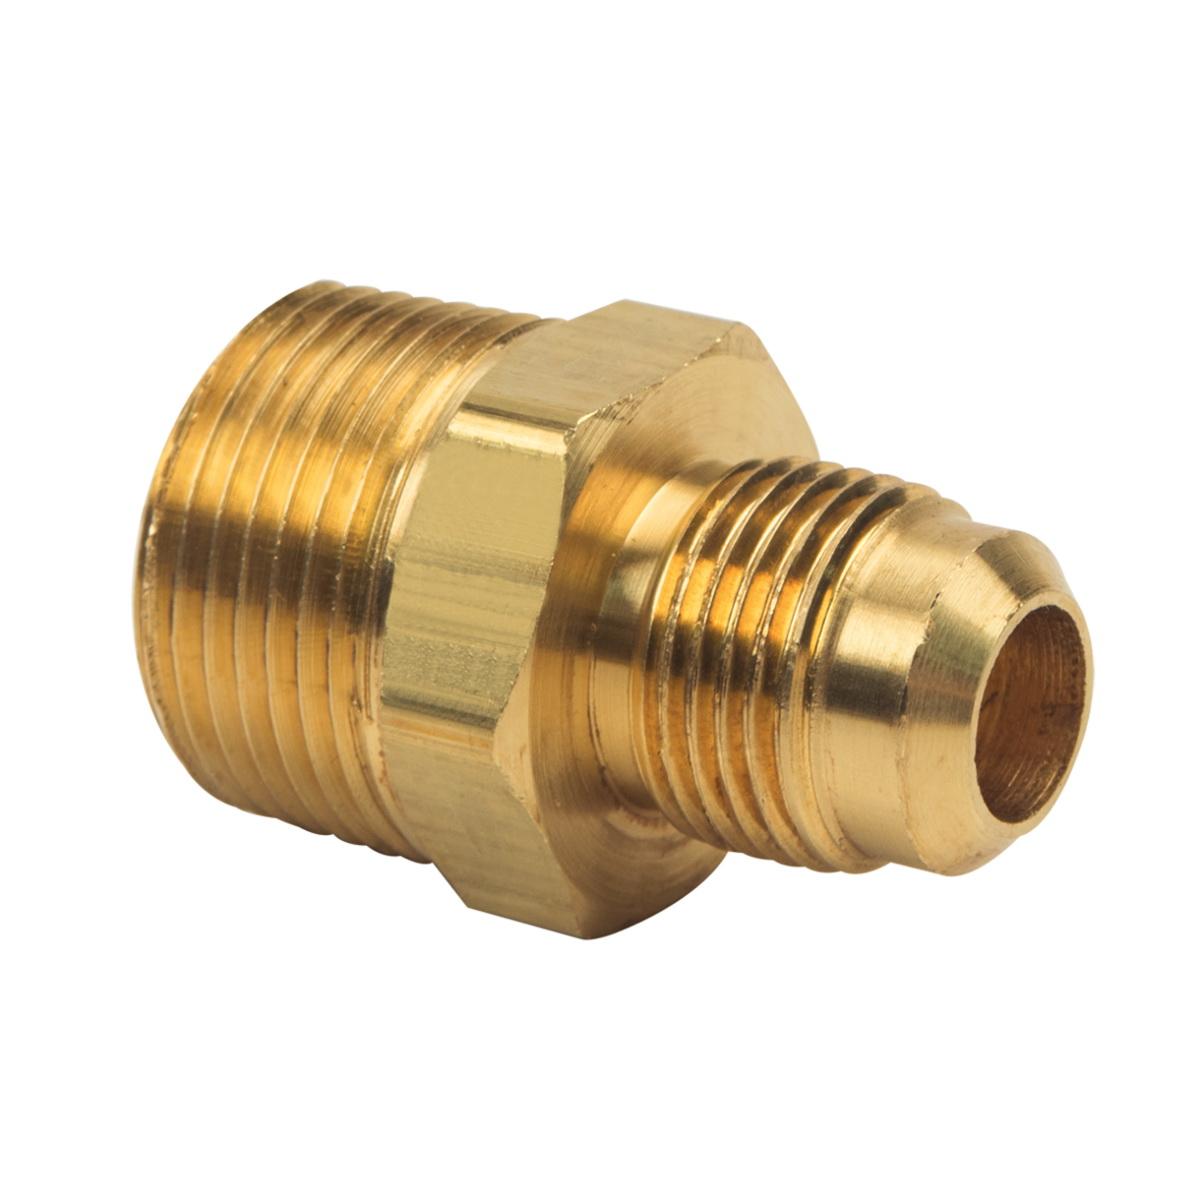 BrassCraft® 48-8-12 Rough Brass Adapter, 1/2 in x 3/4 in, Flare x MIP